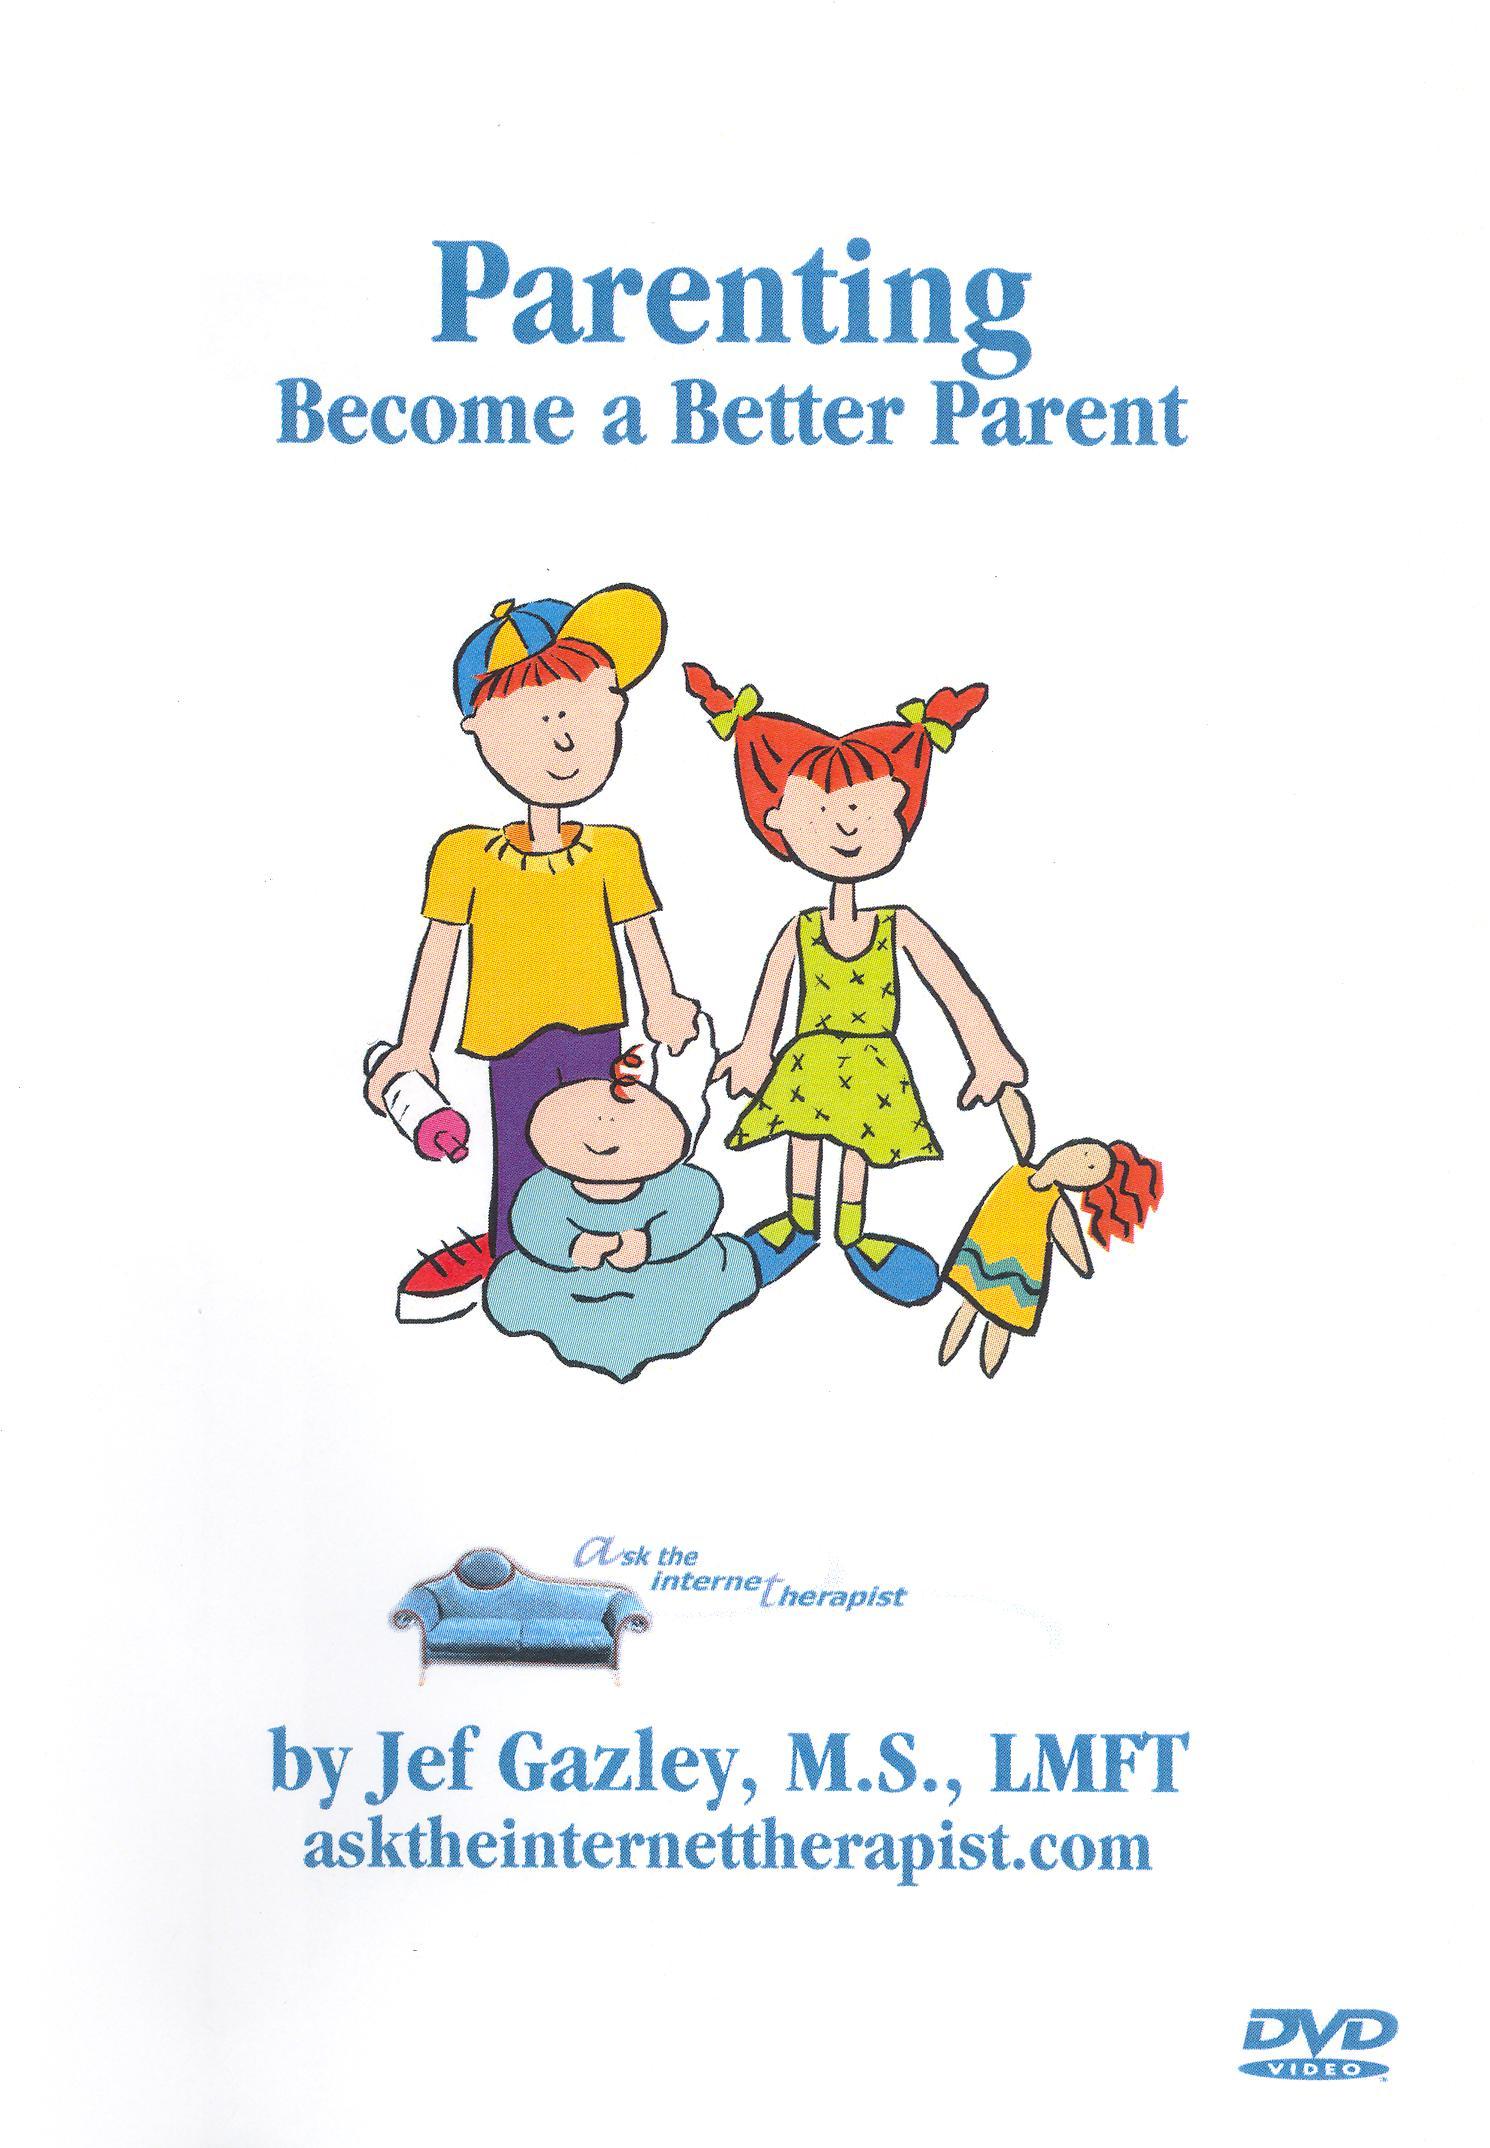 Parenting: Become a Better Parent